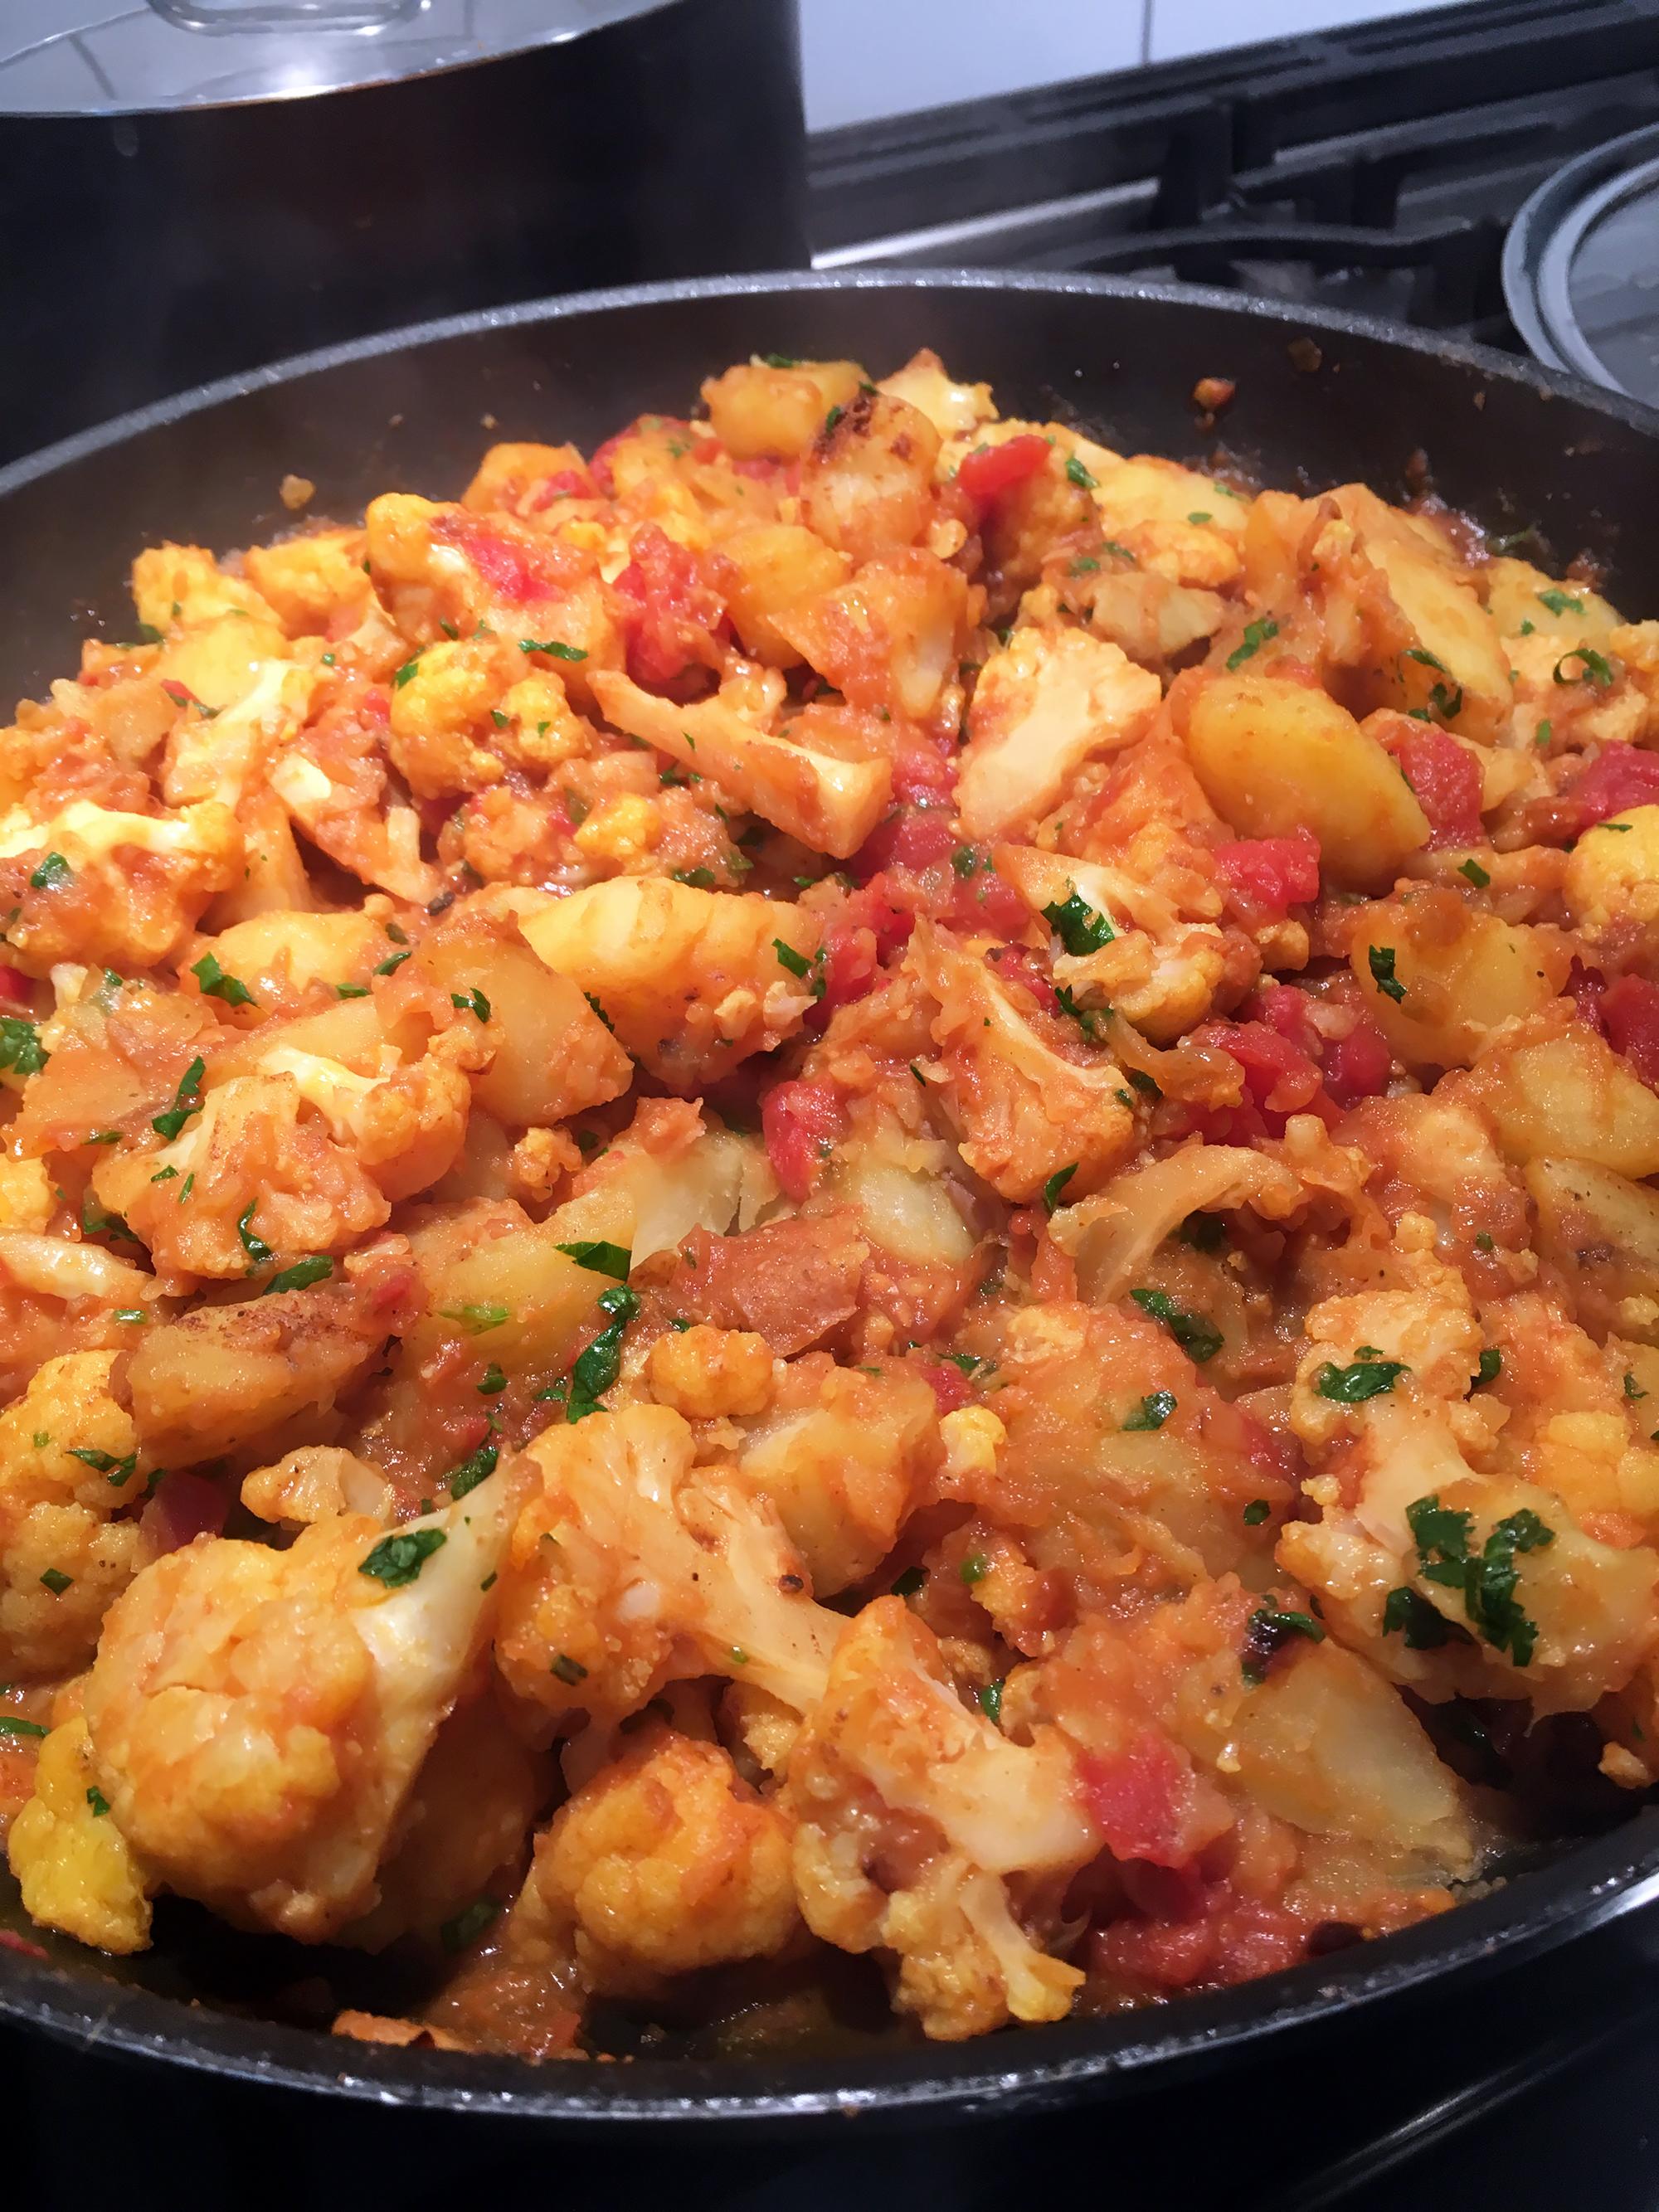 Stir in the garam masala and cilantro.